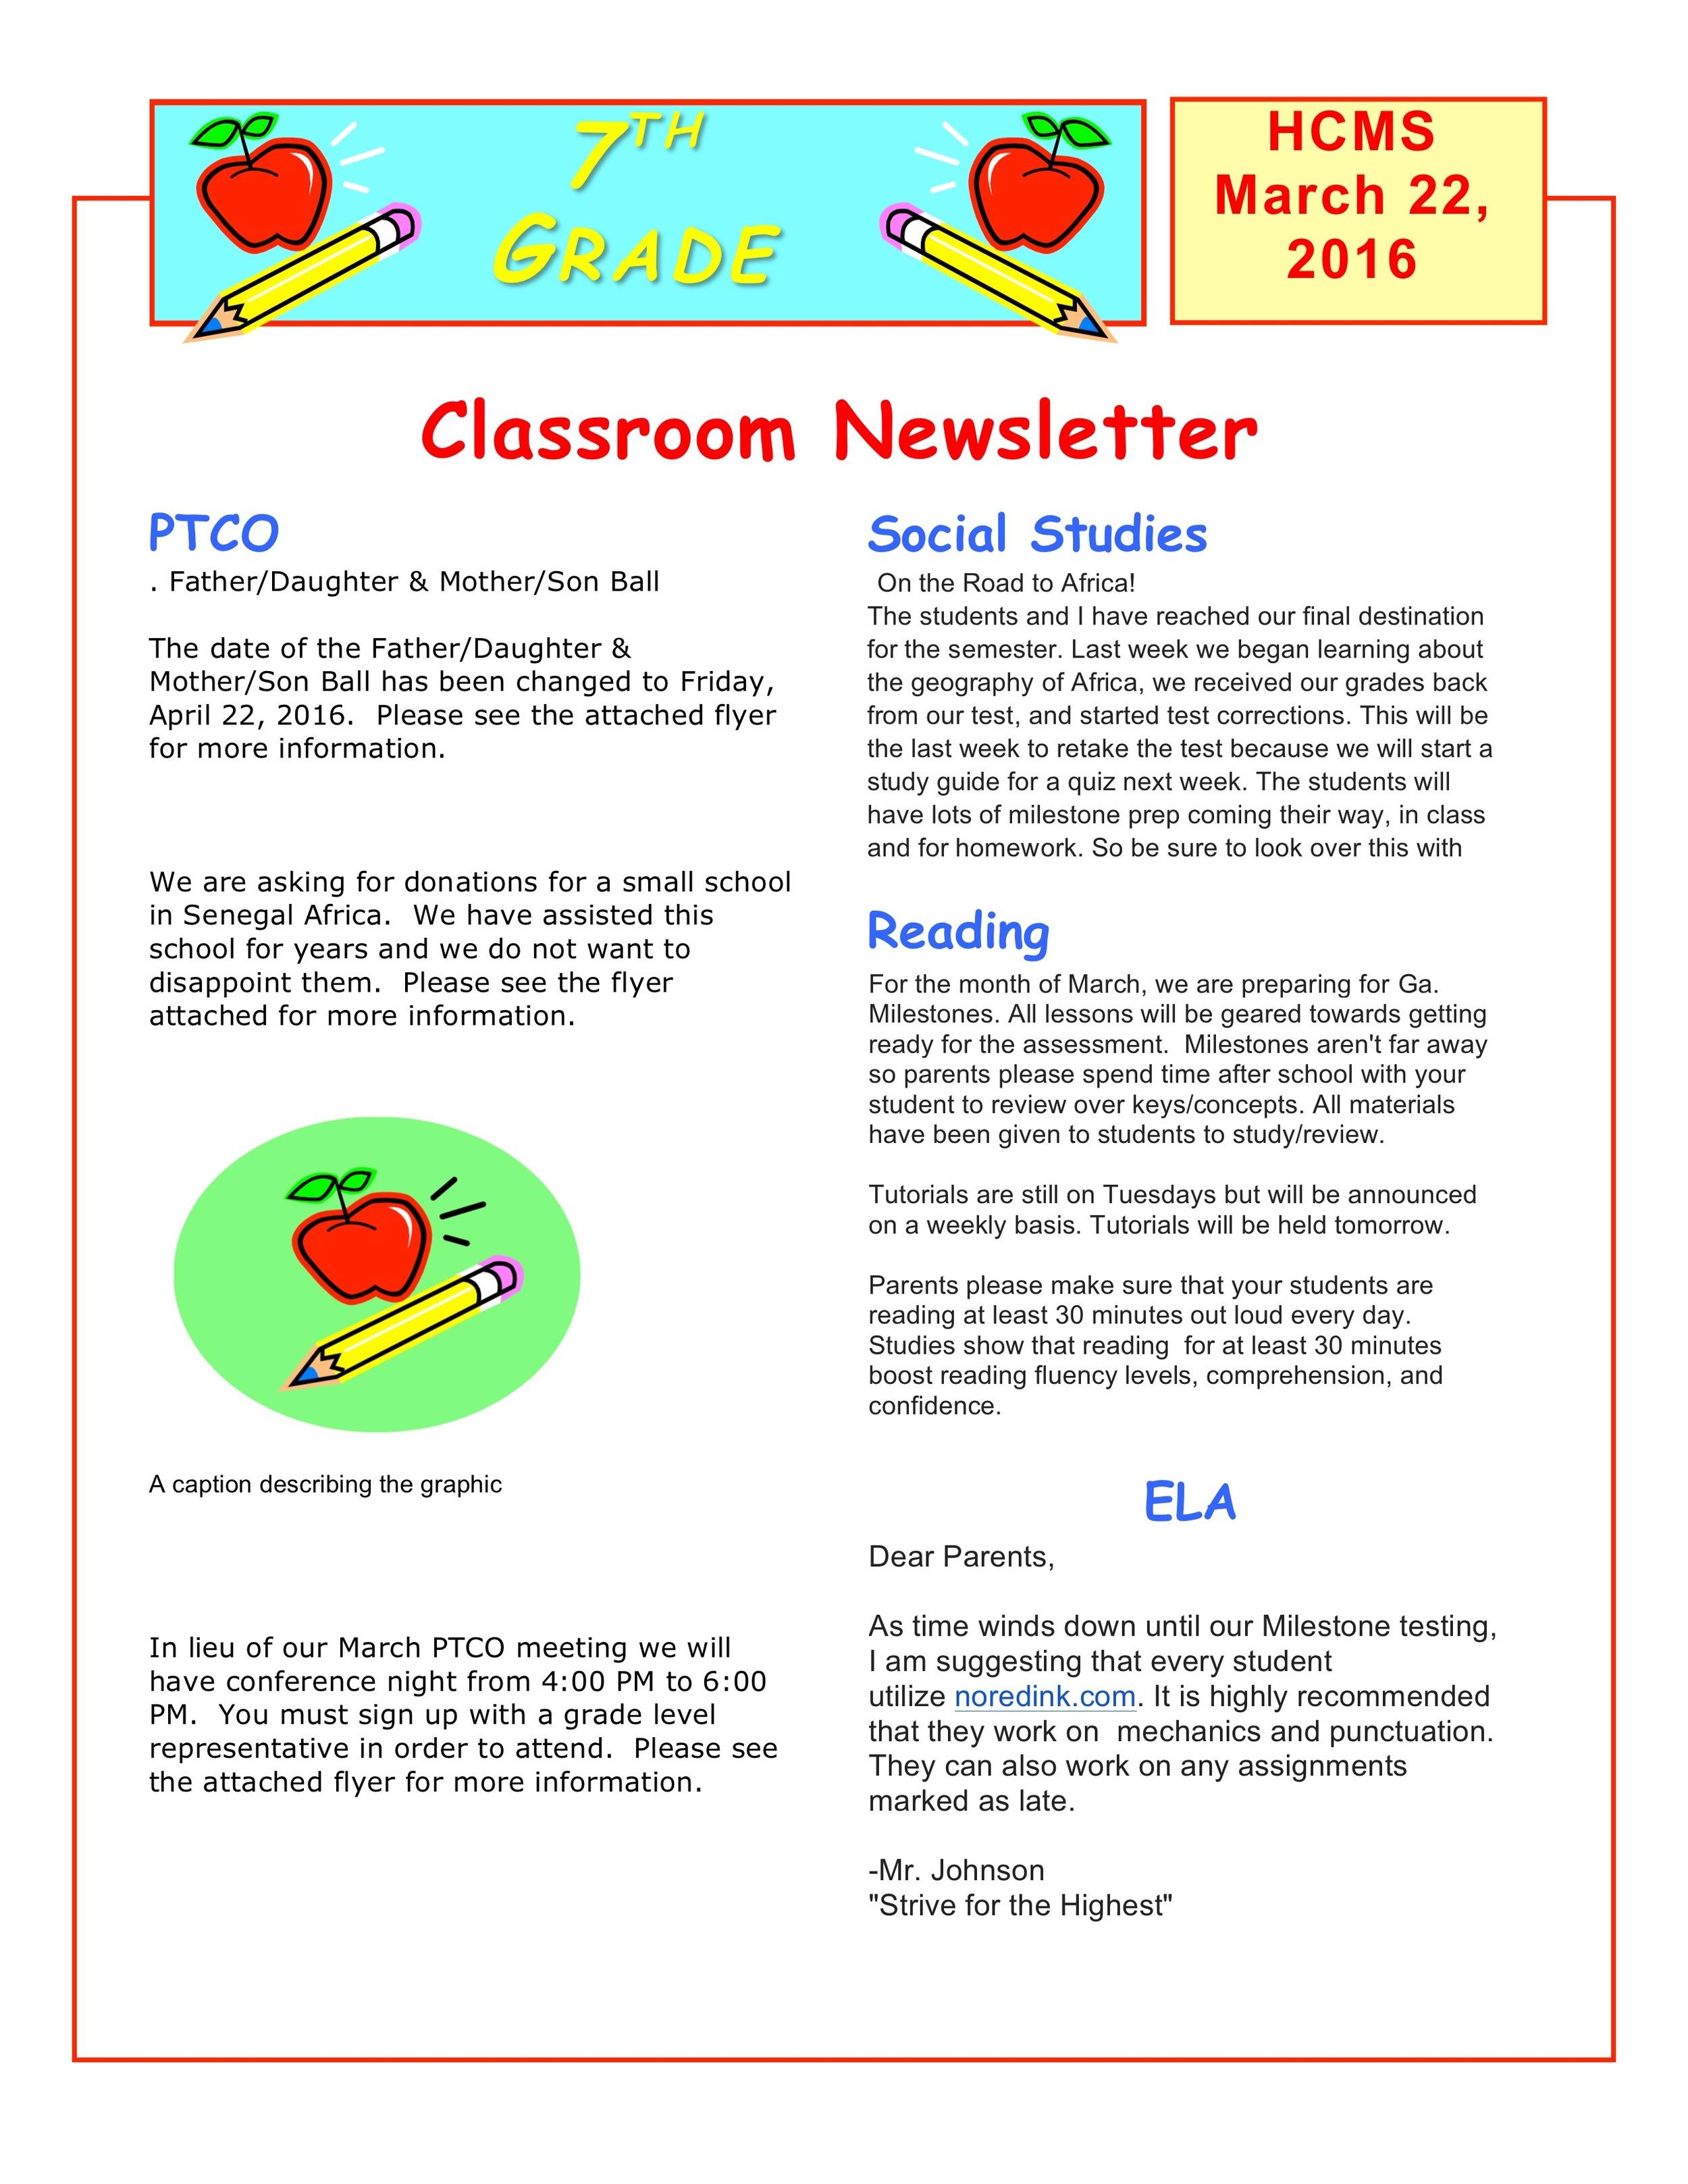 Newsletter Image7th grade 3-23-16.jpeg